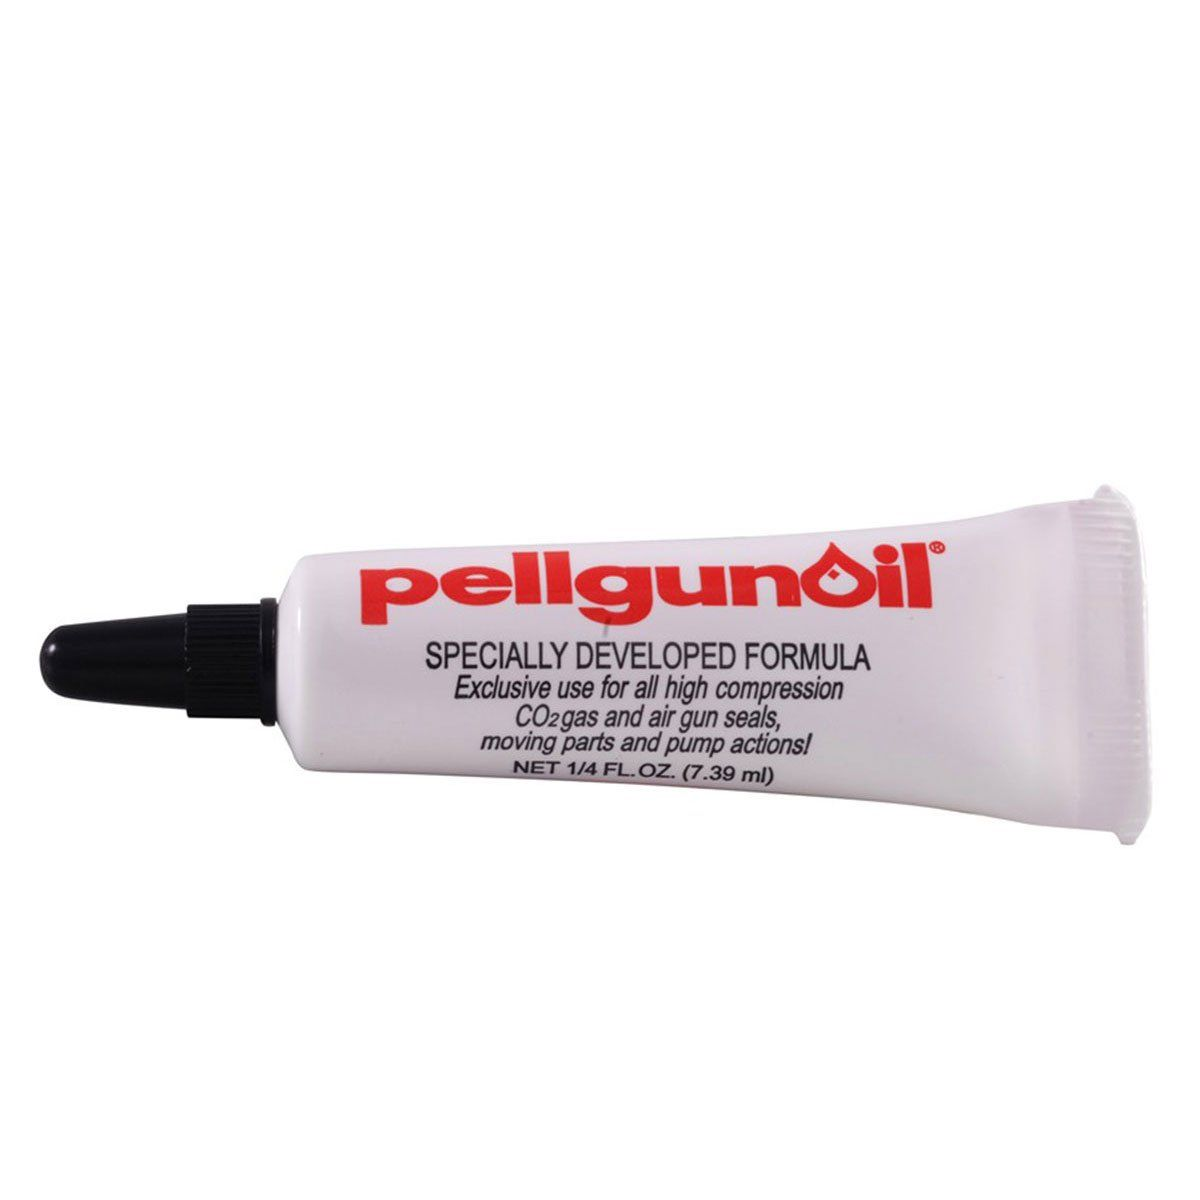 Oleo Lubrificante Pellgunoil Crosman p/ CO2